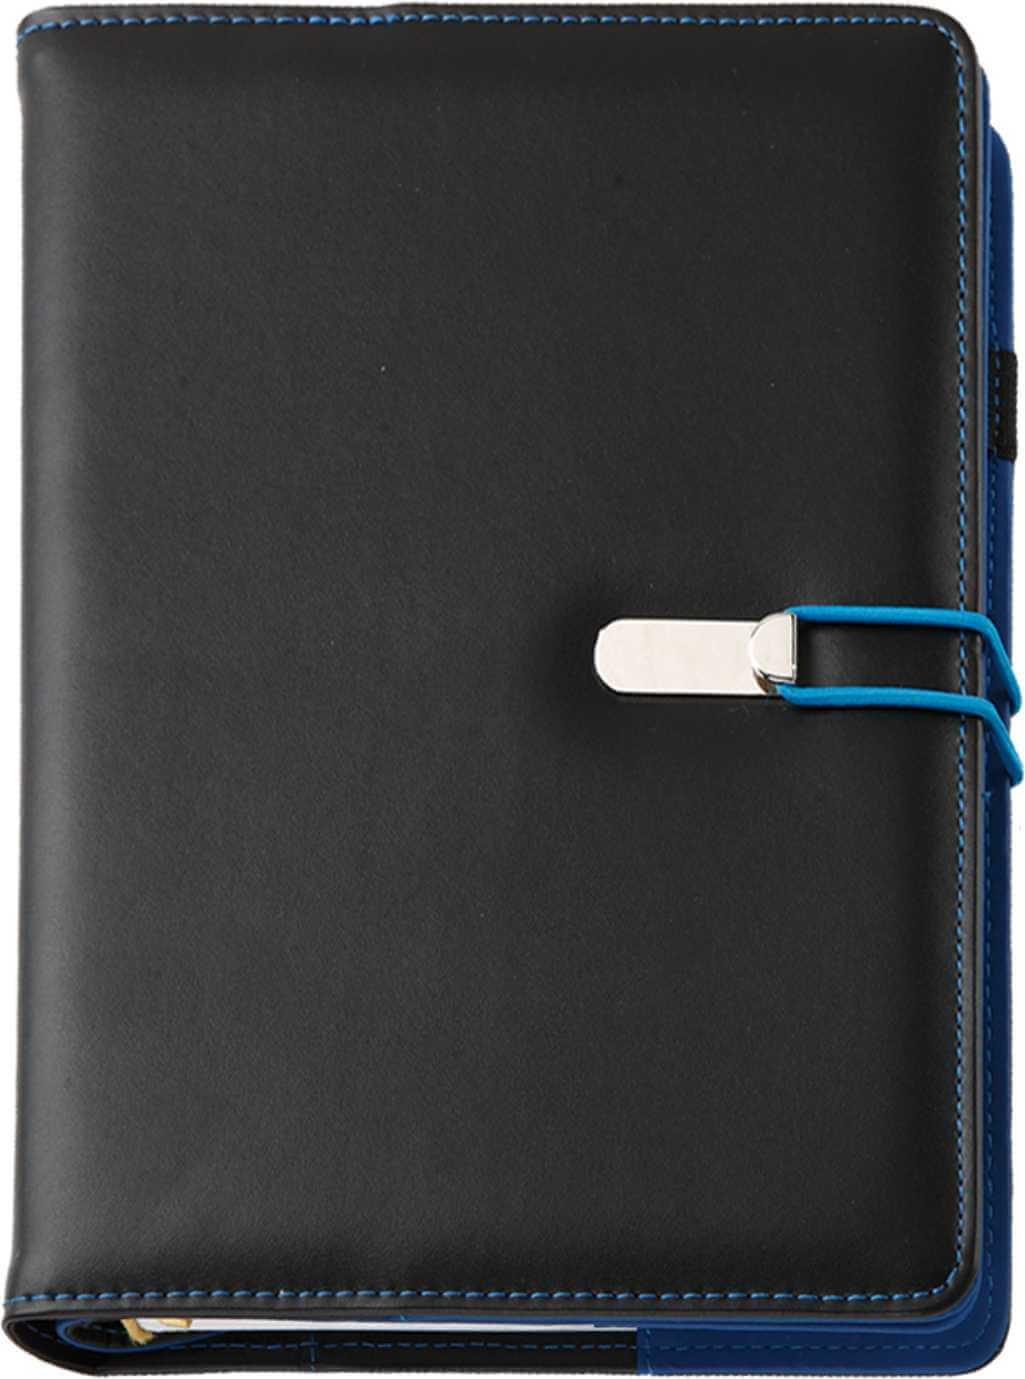 Agenda Lux Clio Negru-Albastru